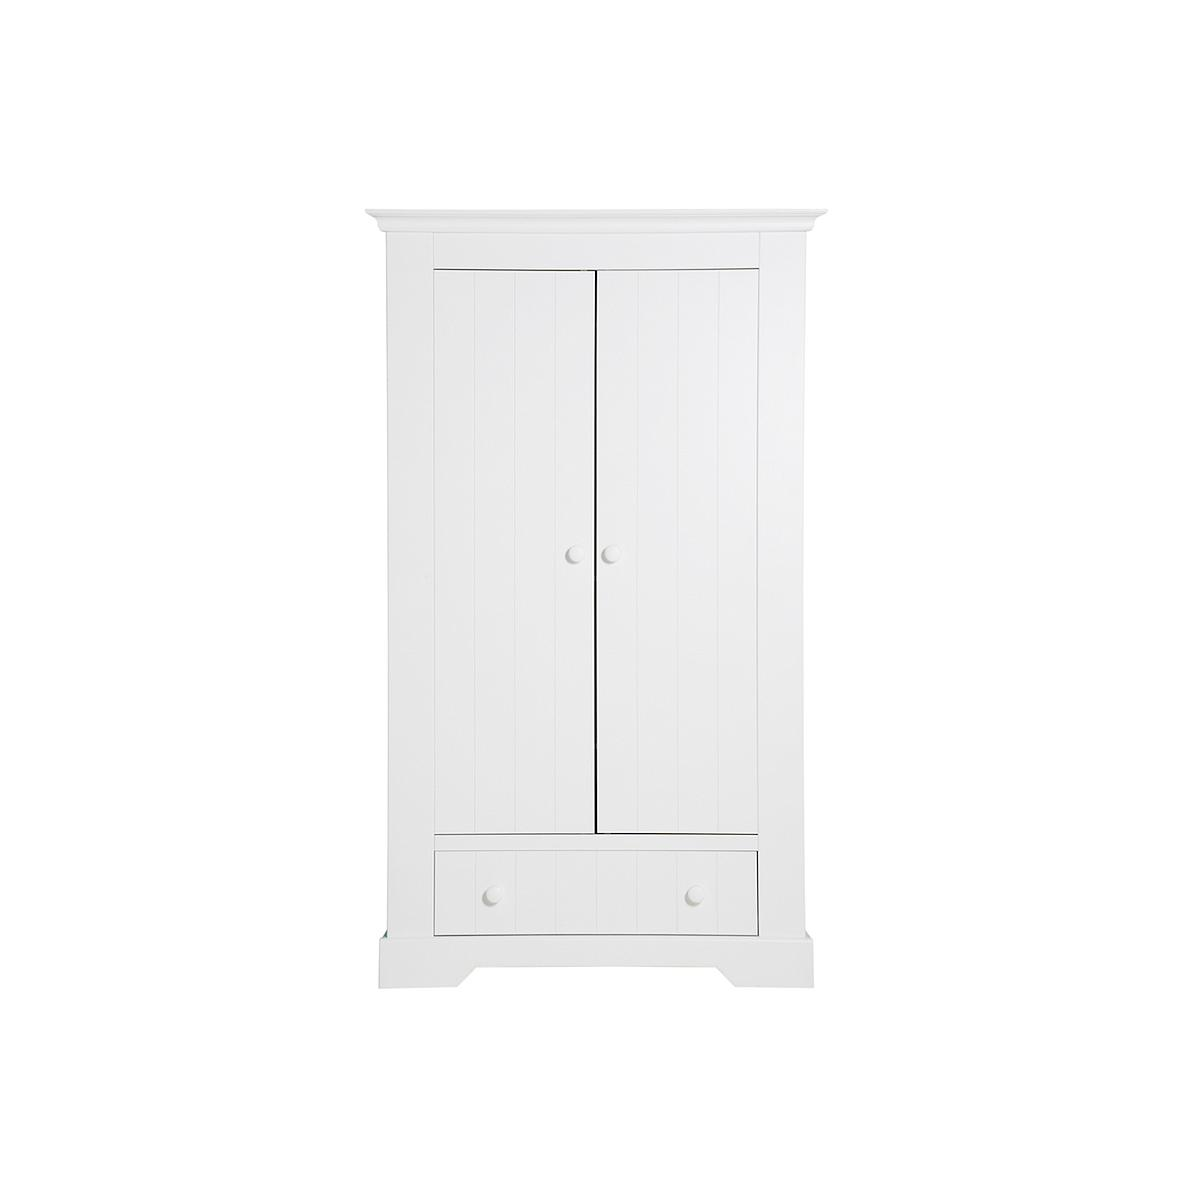 NARBONNE by Bopita Armoire 2 portes et tiroir